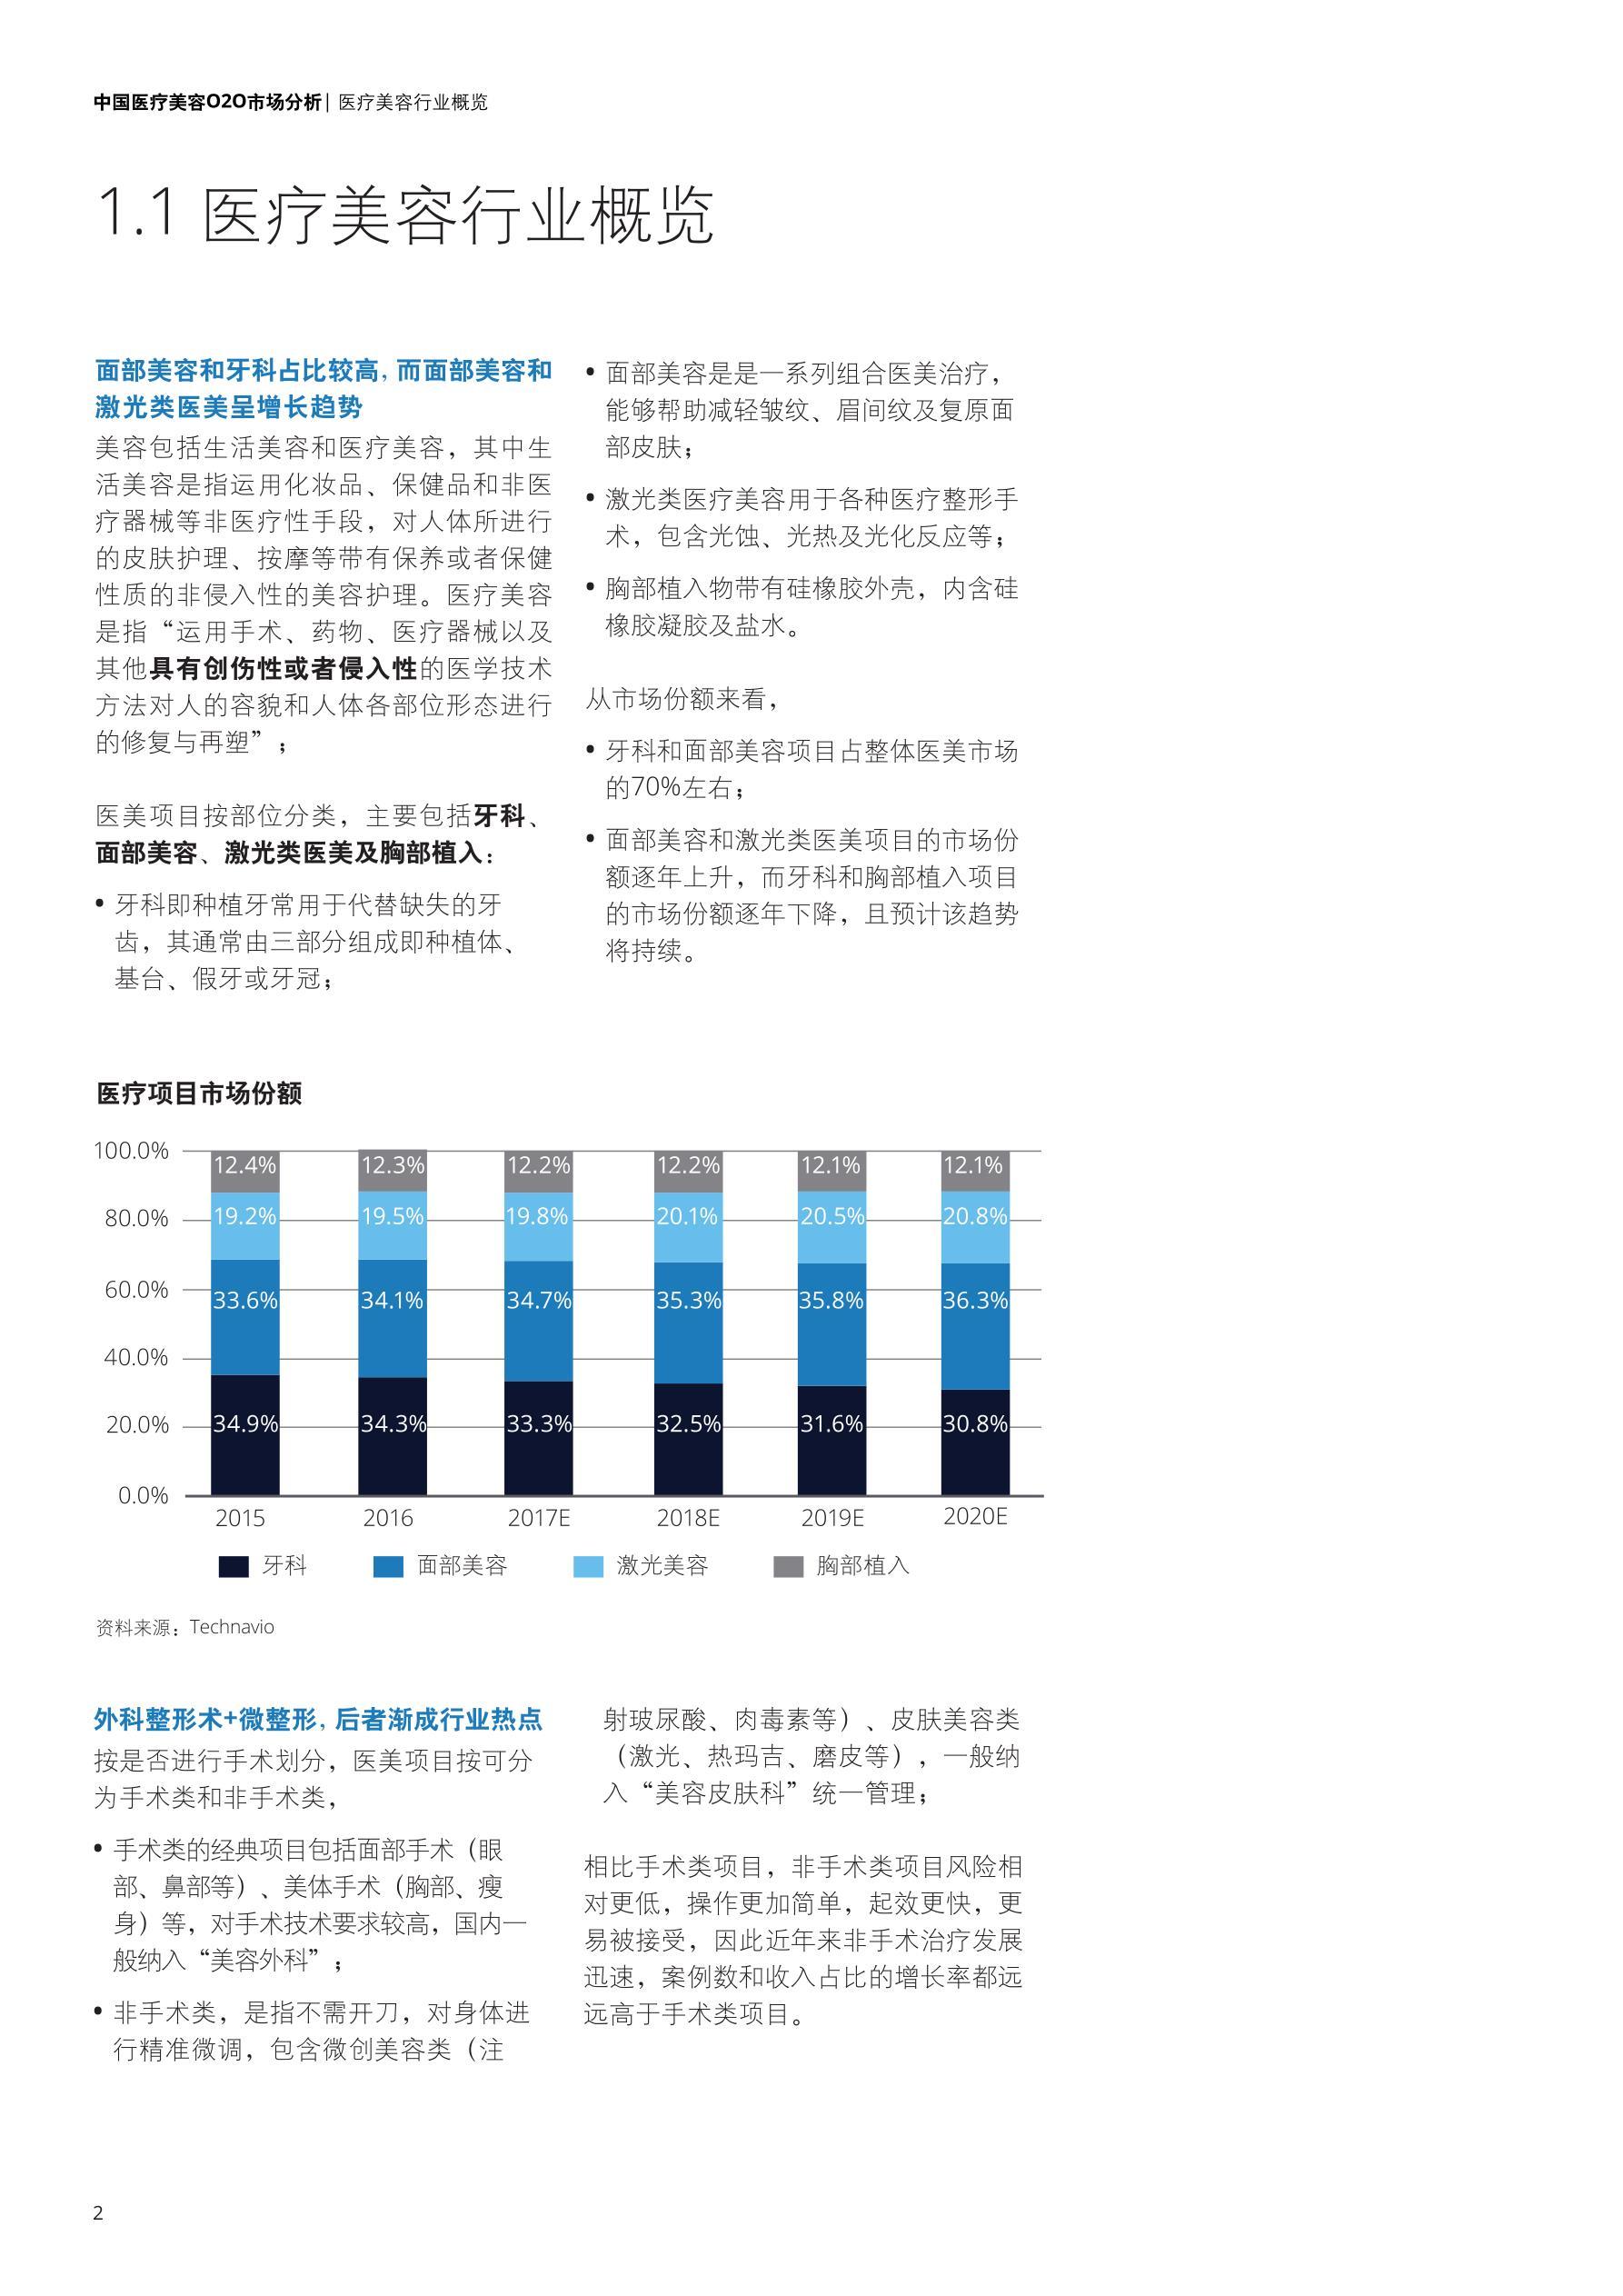 deloitte-cn-lshc-china-medical-cosmetology-o2o-market-analysis-zh-180914(1)_看图王_4